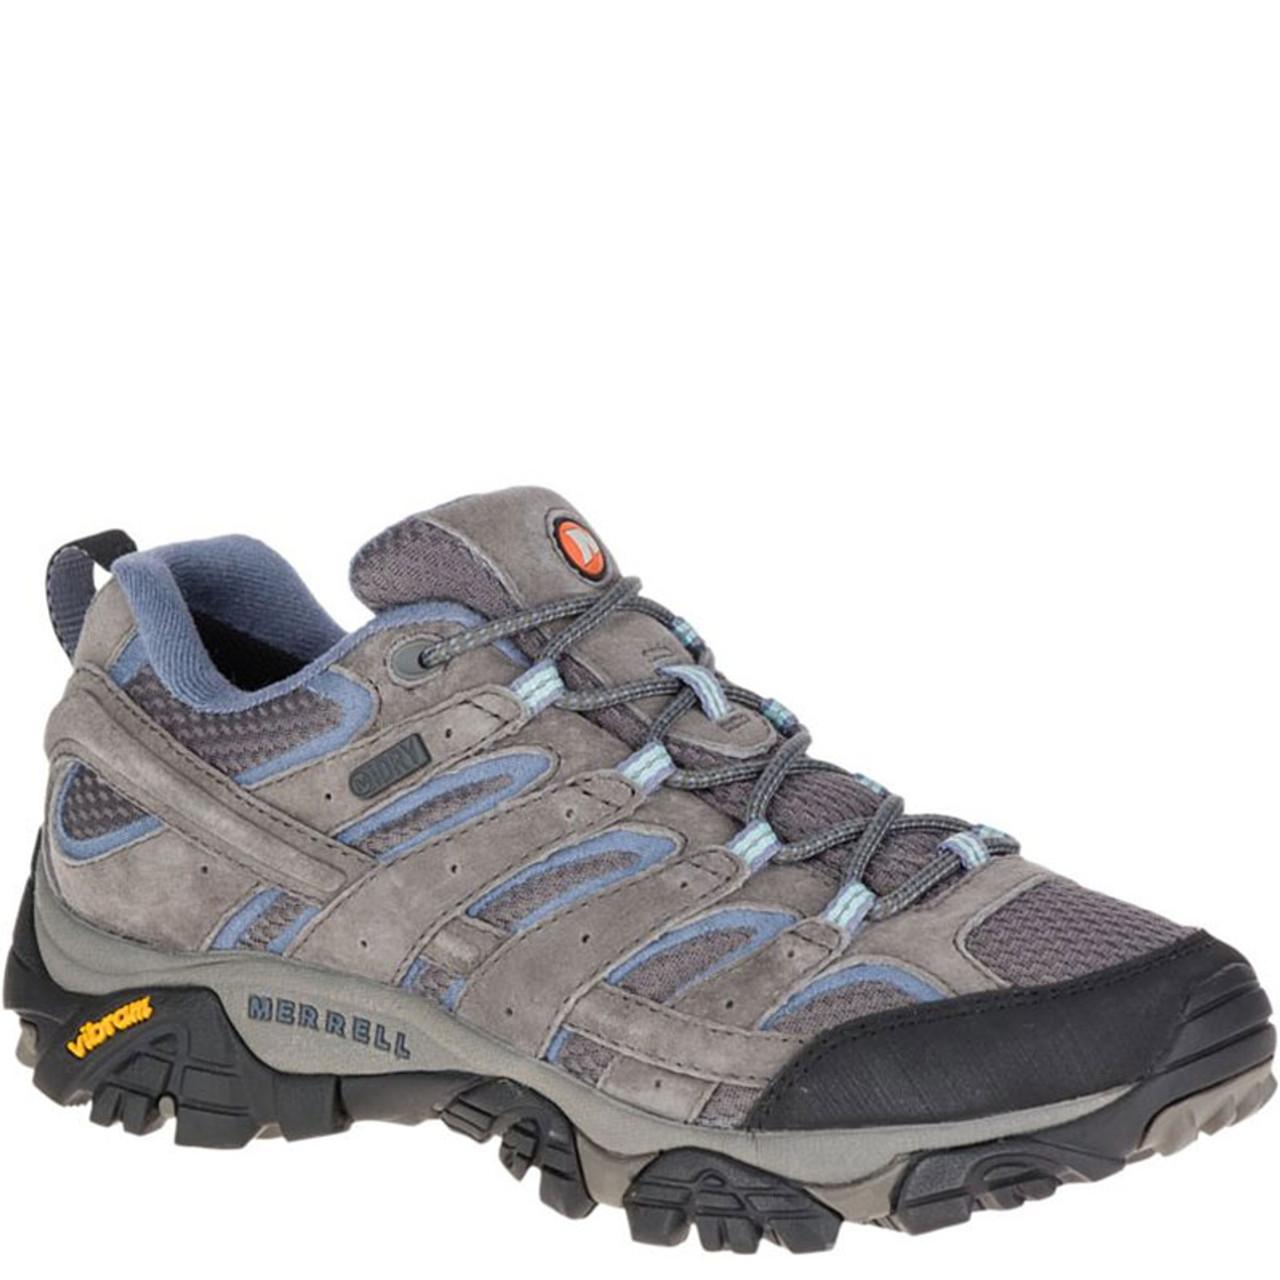 merrell women's moab waterproof hiking boot